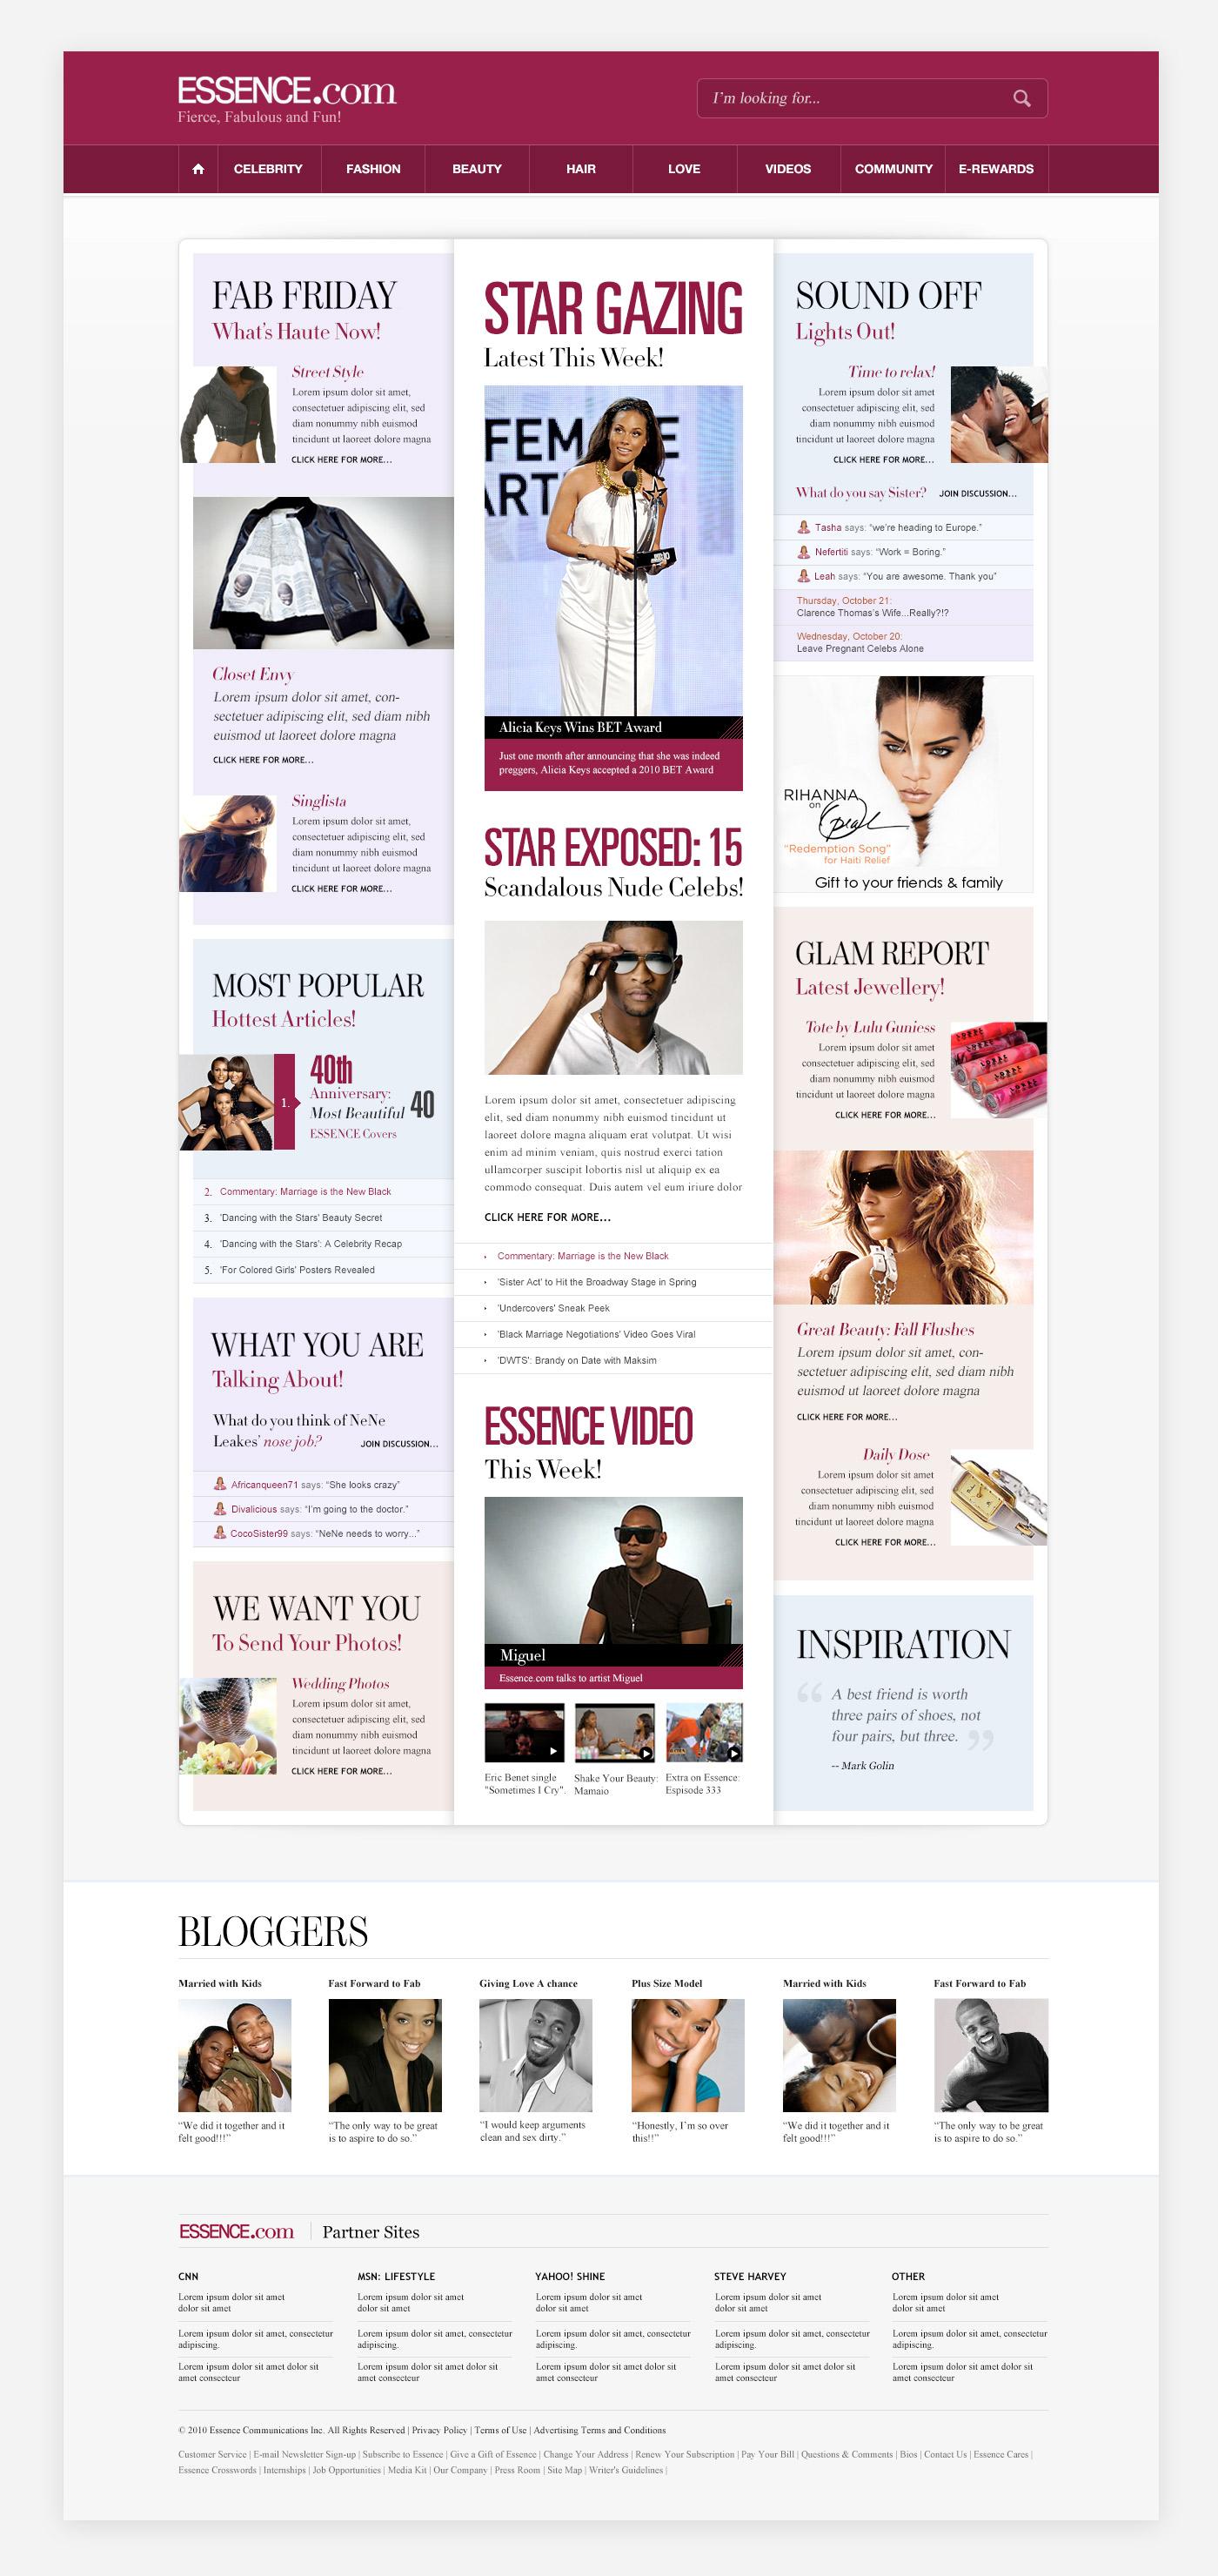 essence-website-2